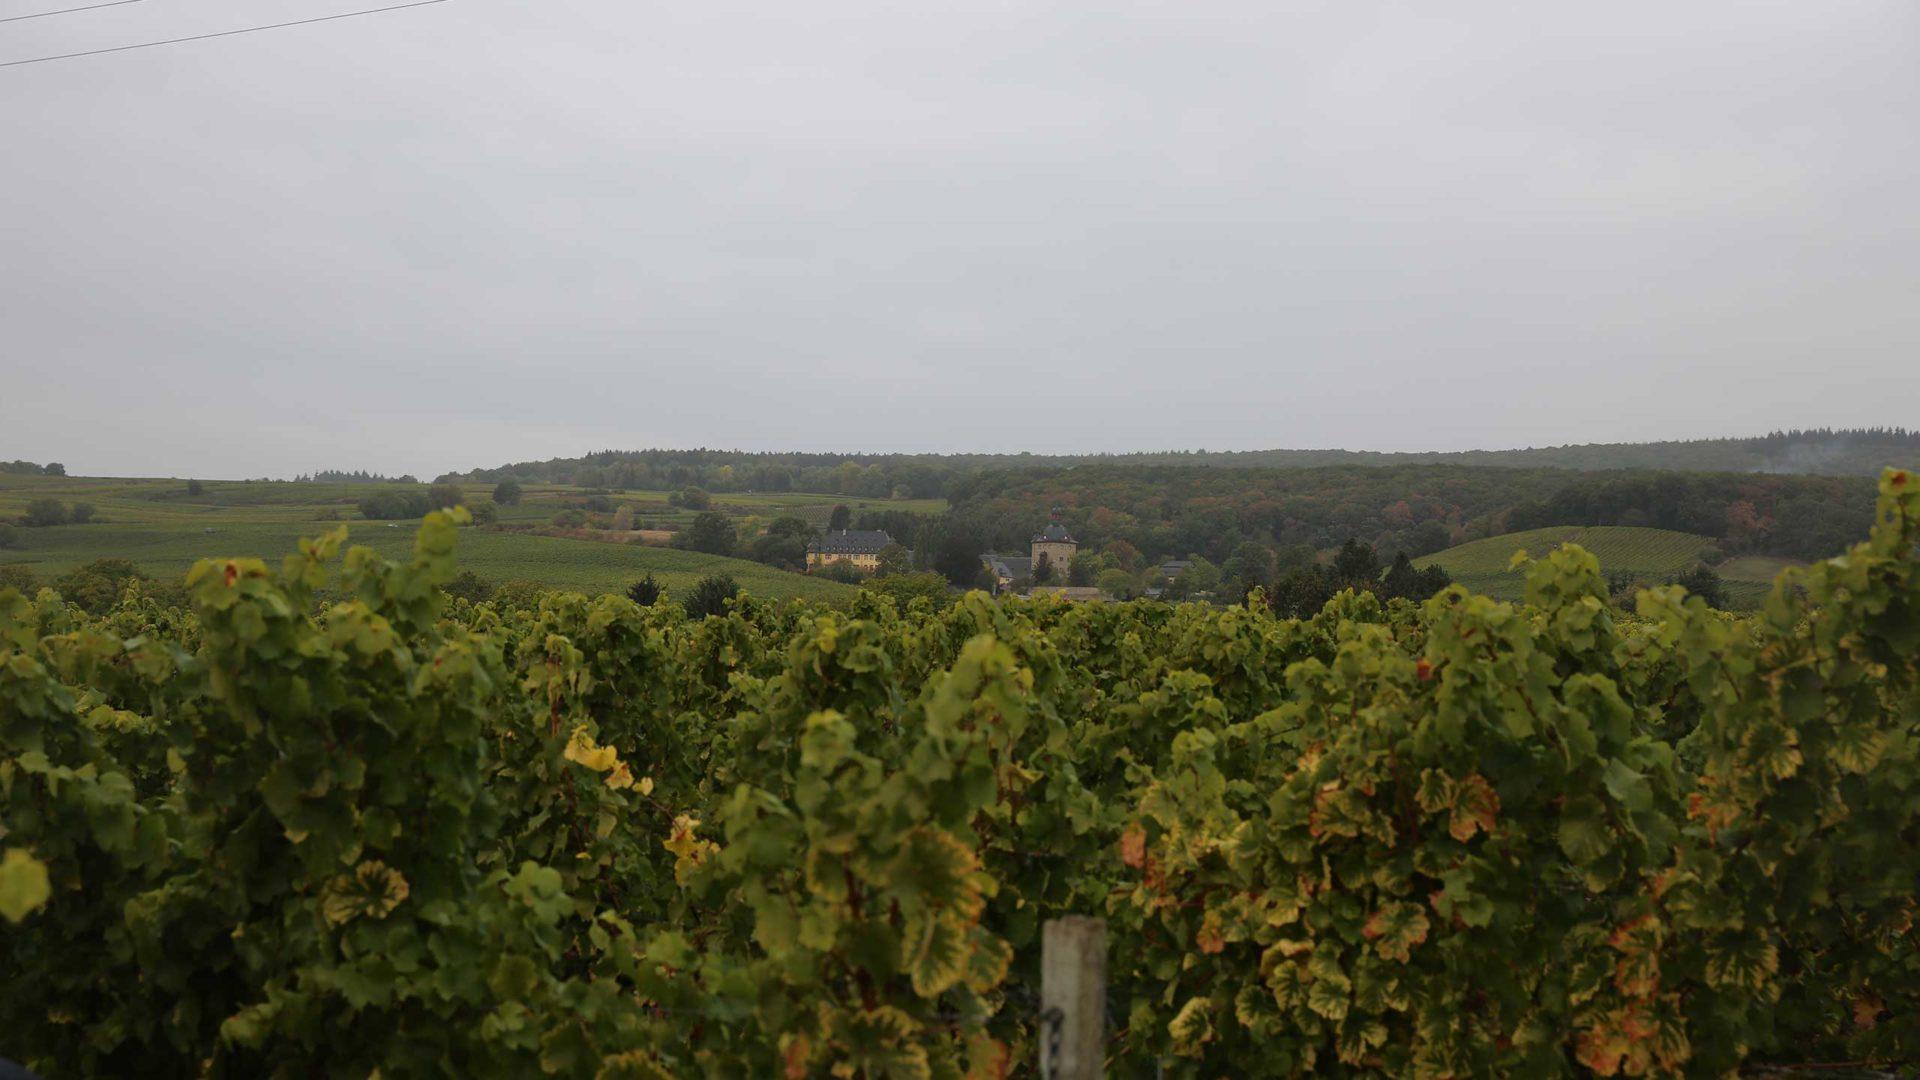 Landschaftsaufnahme der Umgebung des Jesuitengartens.